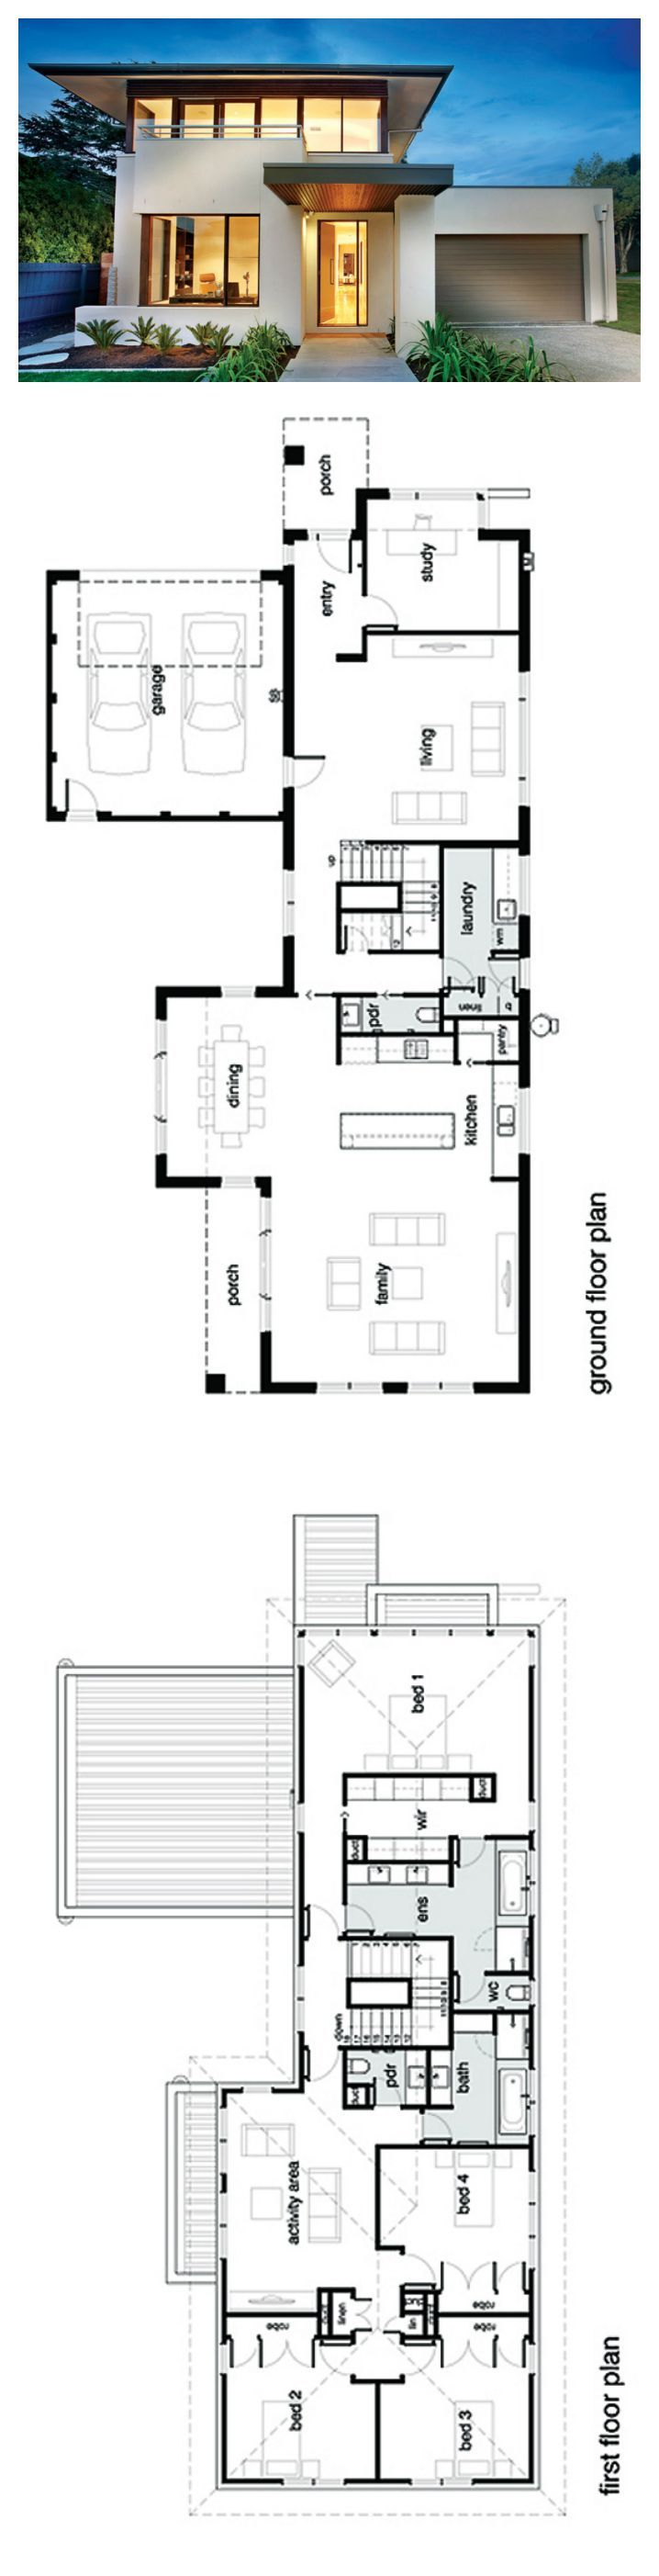 Plan 496 18 3584 sf 4 bed study 2 5 bath 2 car 2 story floor plans house plans house floor plans modern house plans